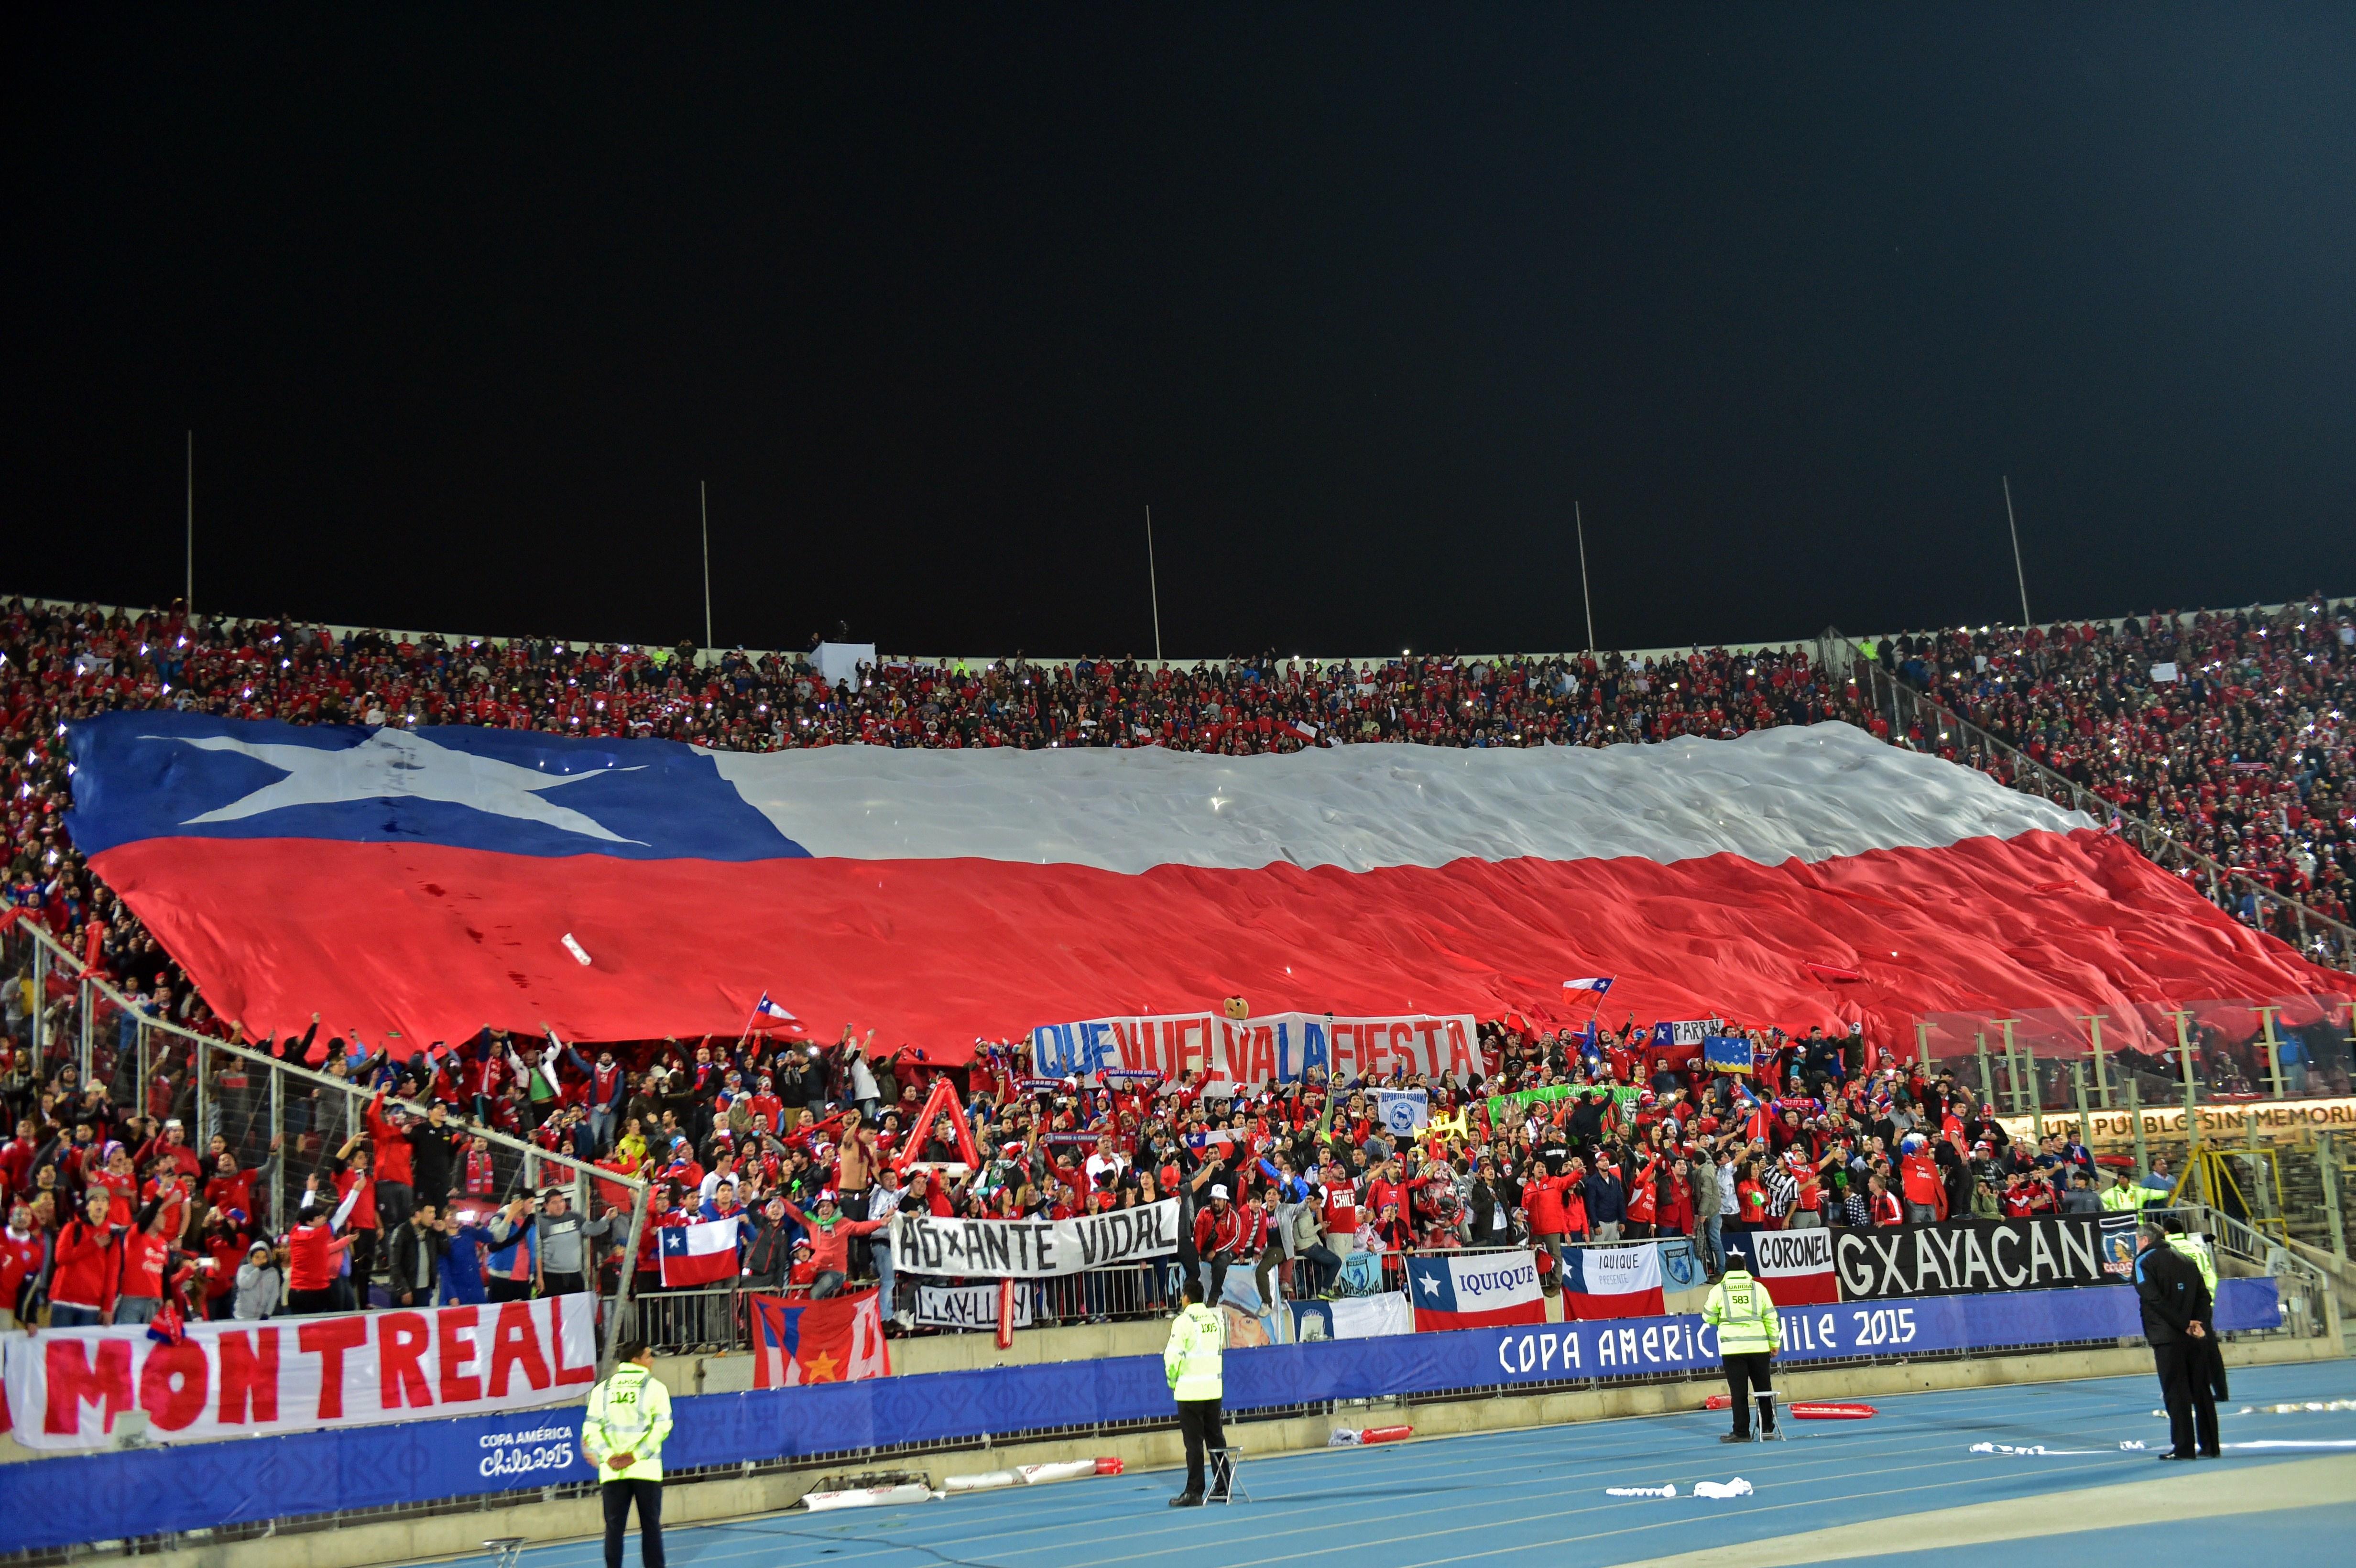 Selección chilena - Chile vs. Bolivia 190615